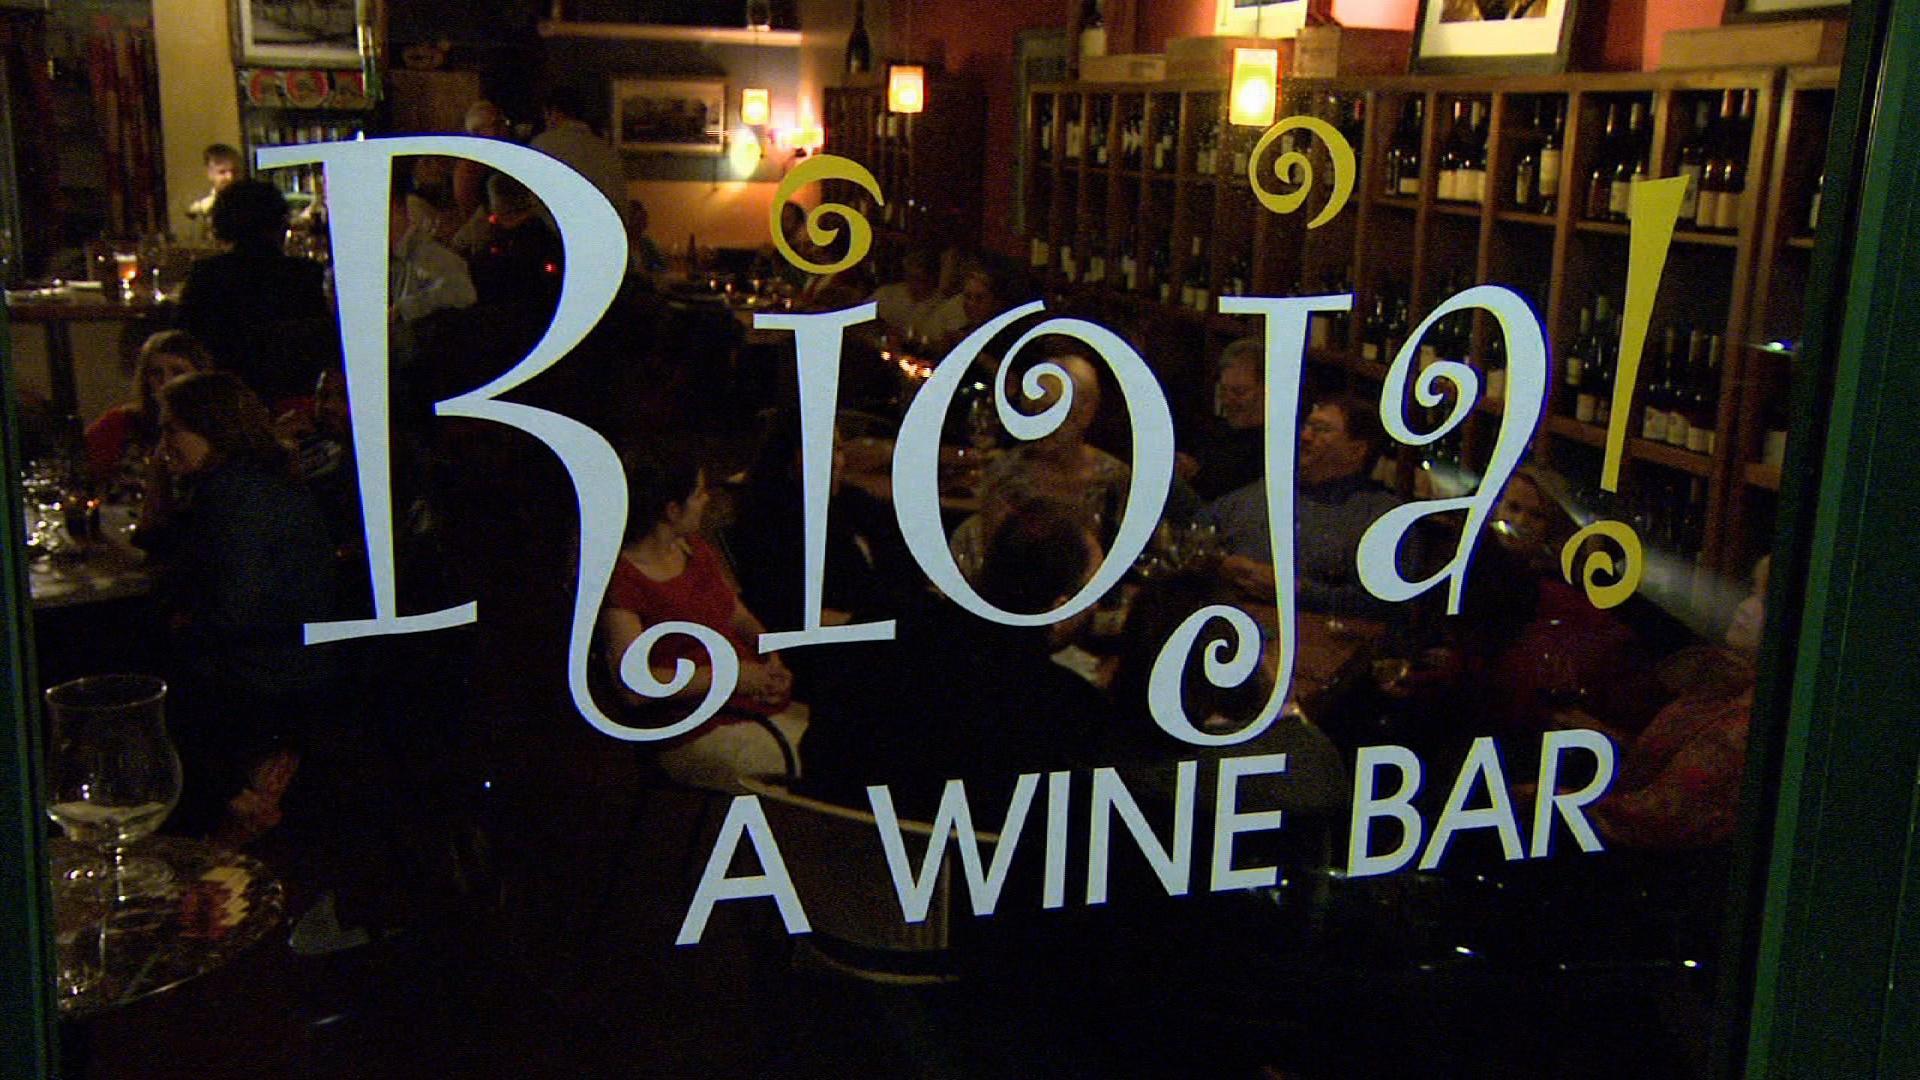 Rioja Wine Bar and Astanza Project image